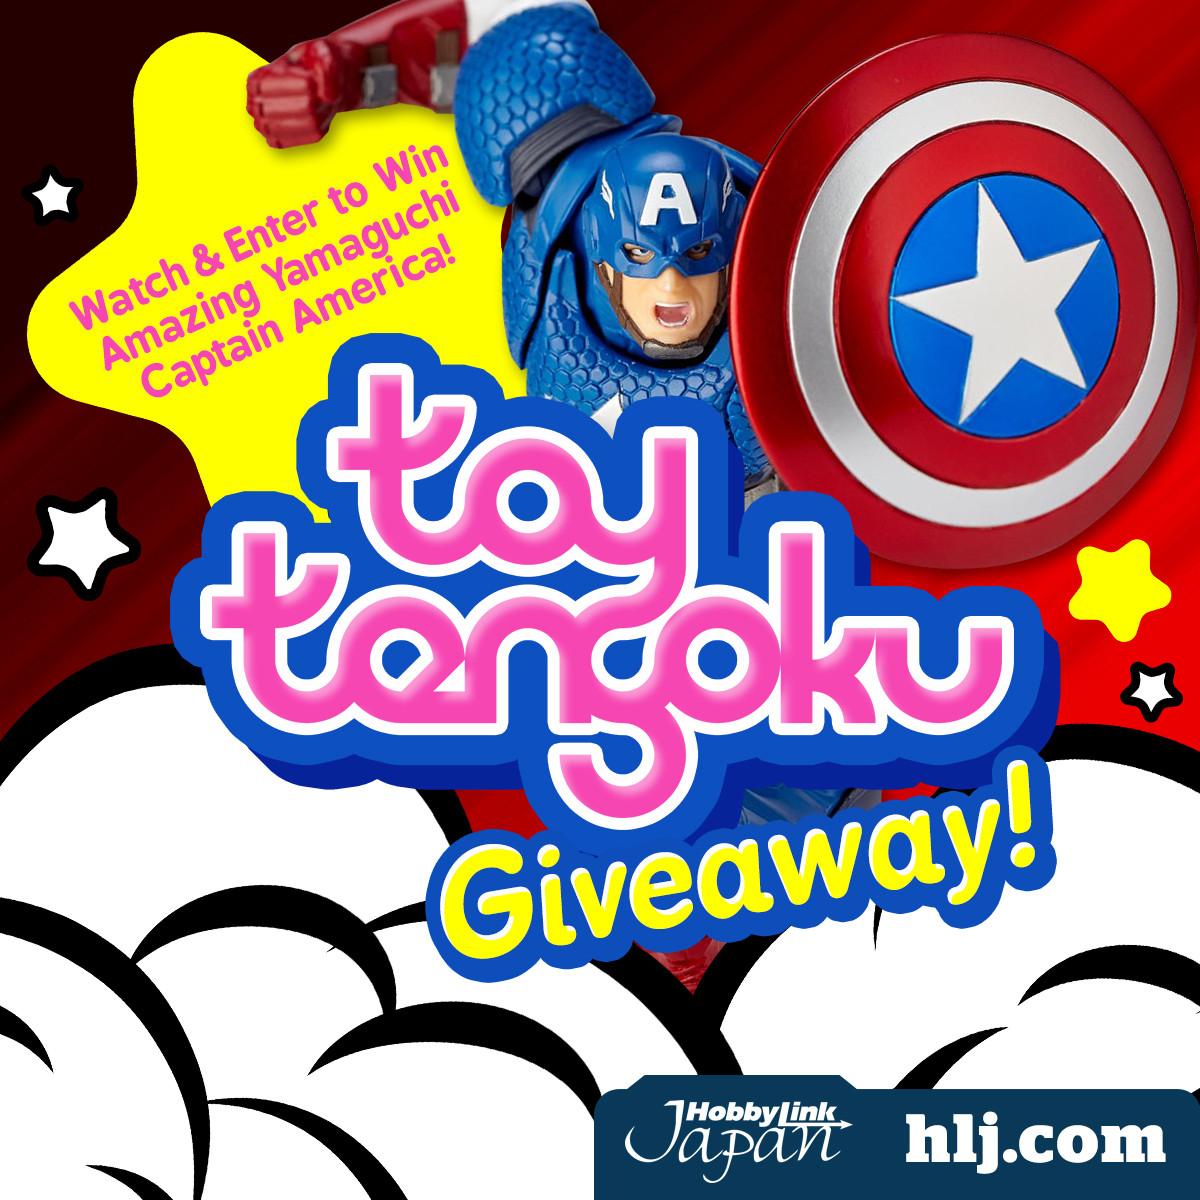 toy_tengoku_contest_03_08_2018_1200